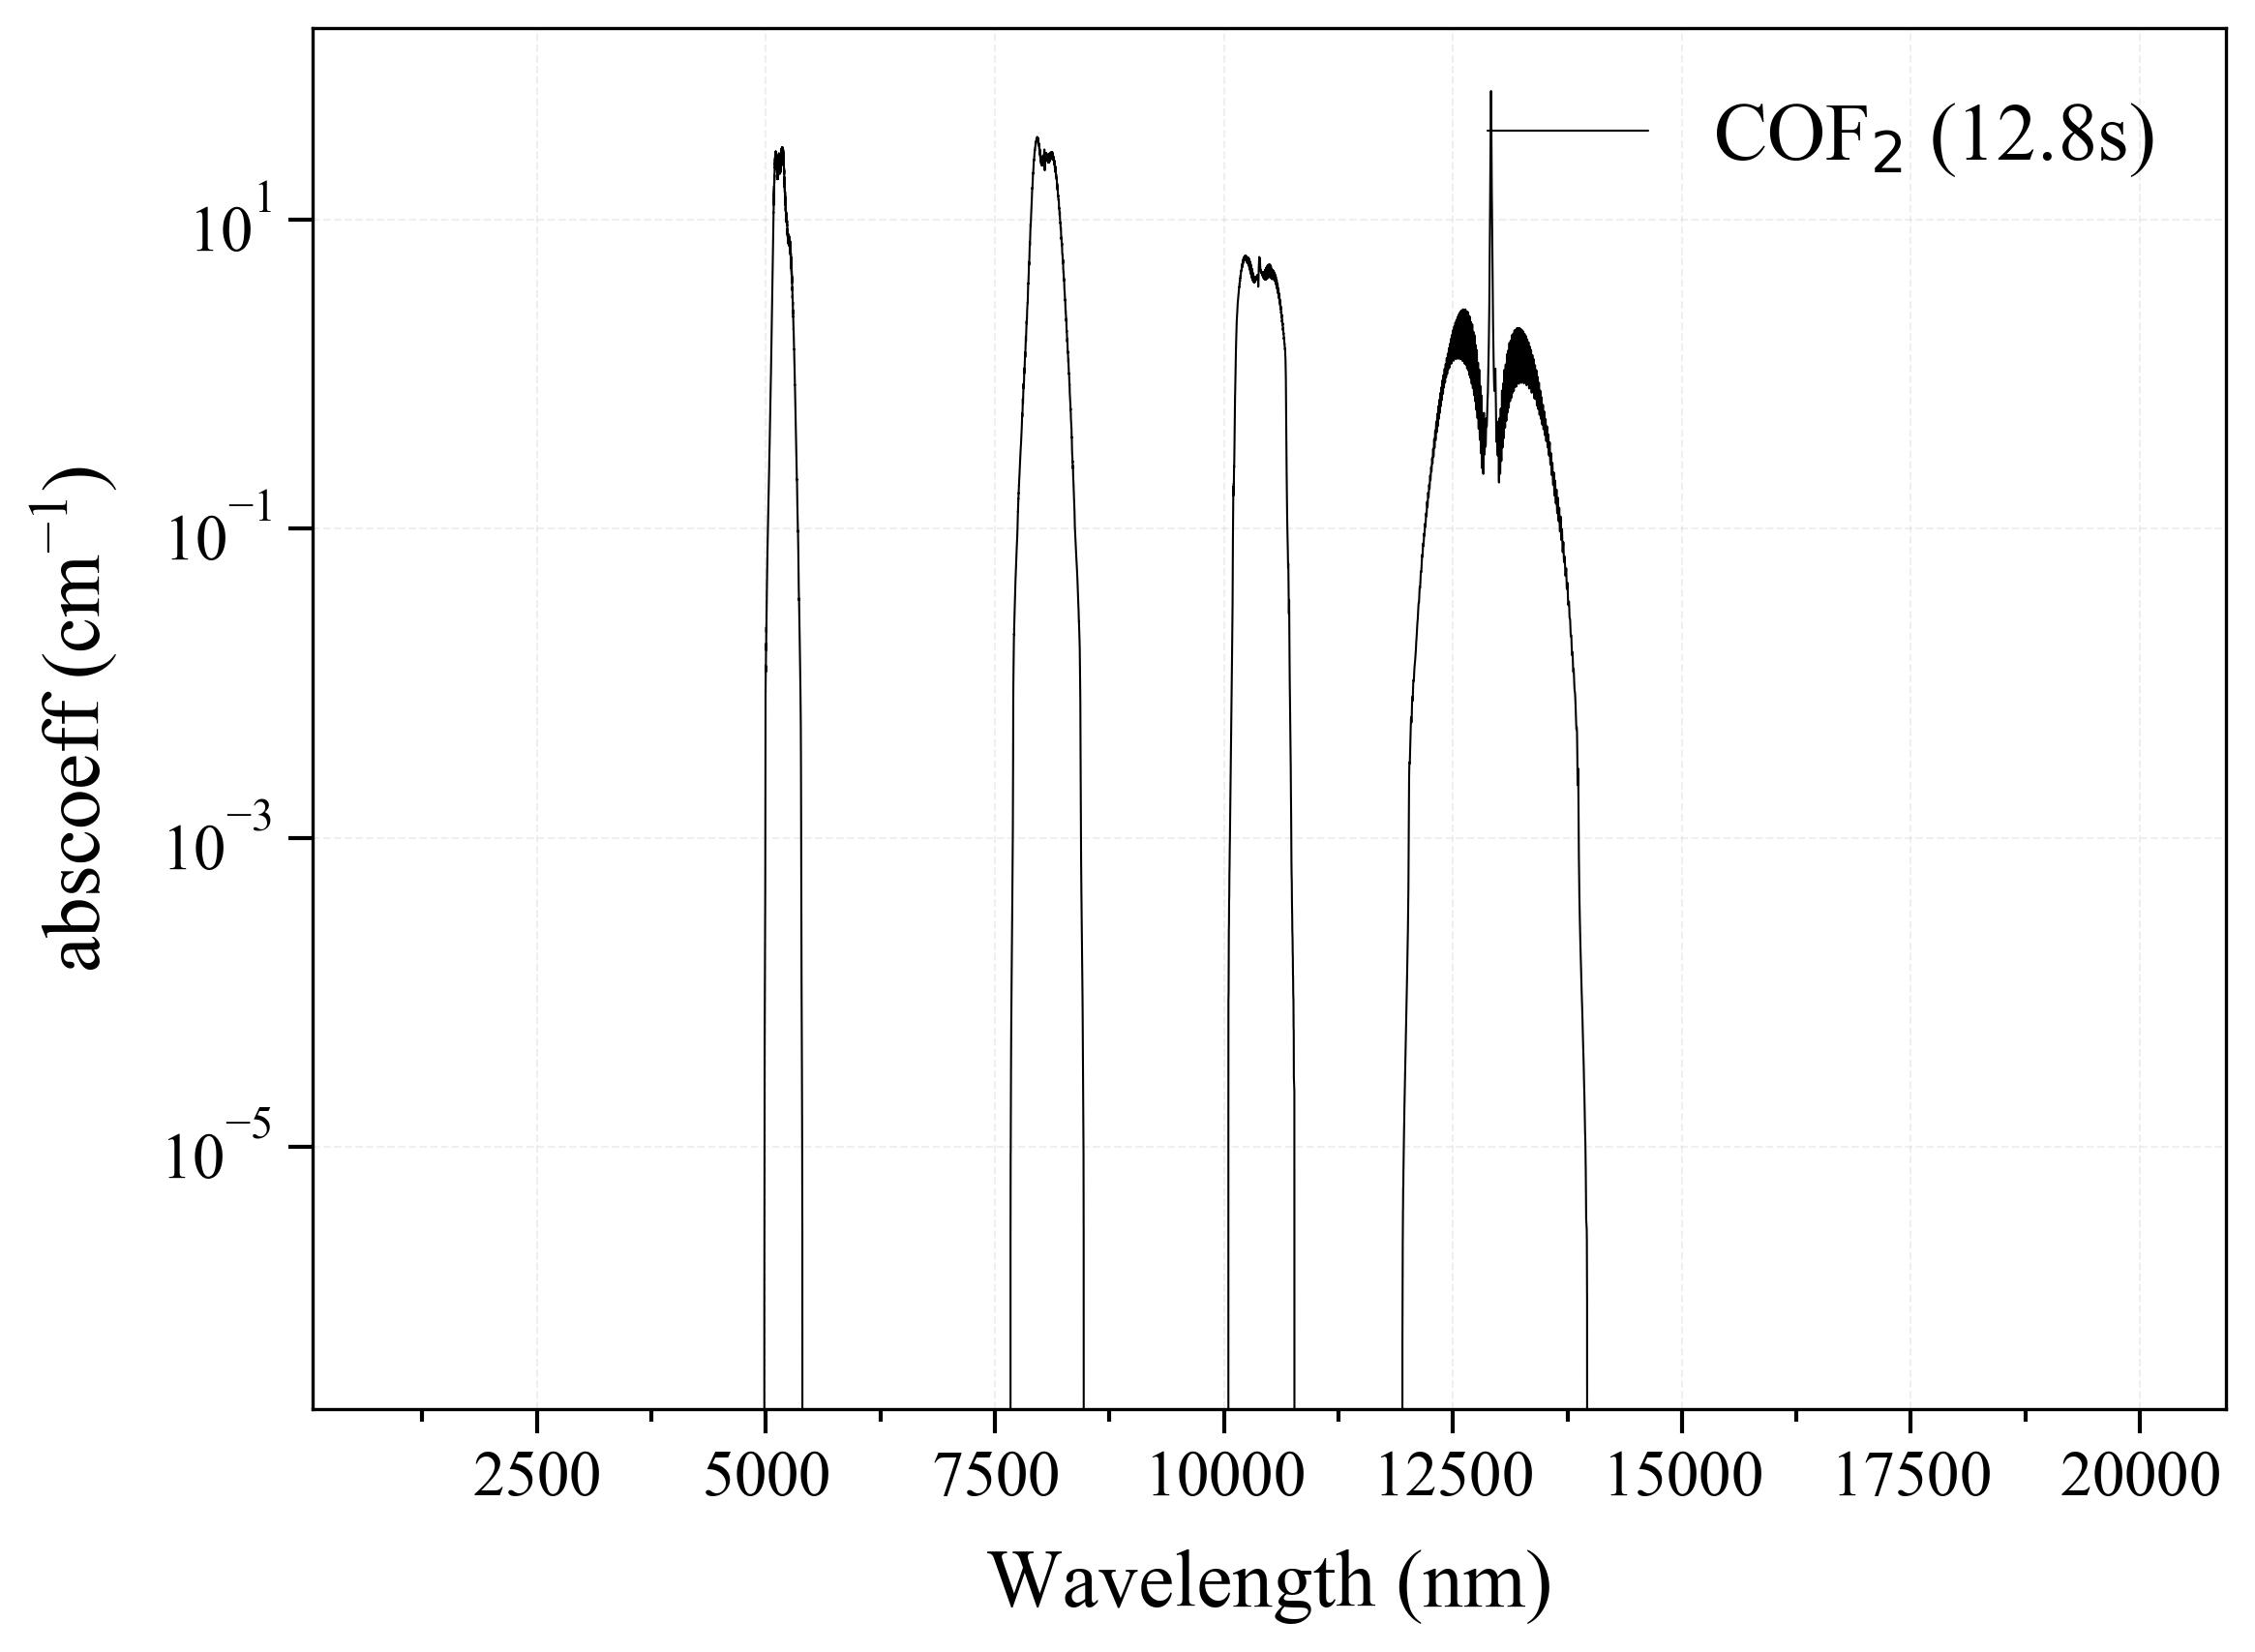 Carbonyl Fluoride COF2 infrared absorption coefficient